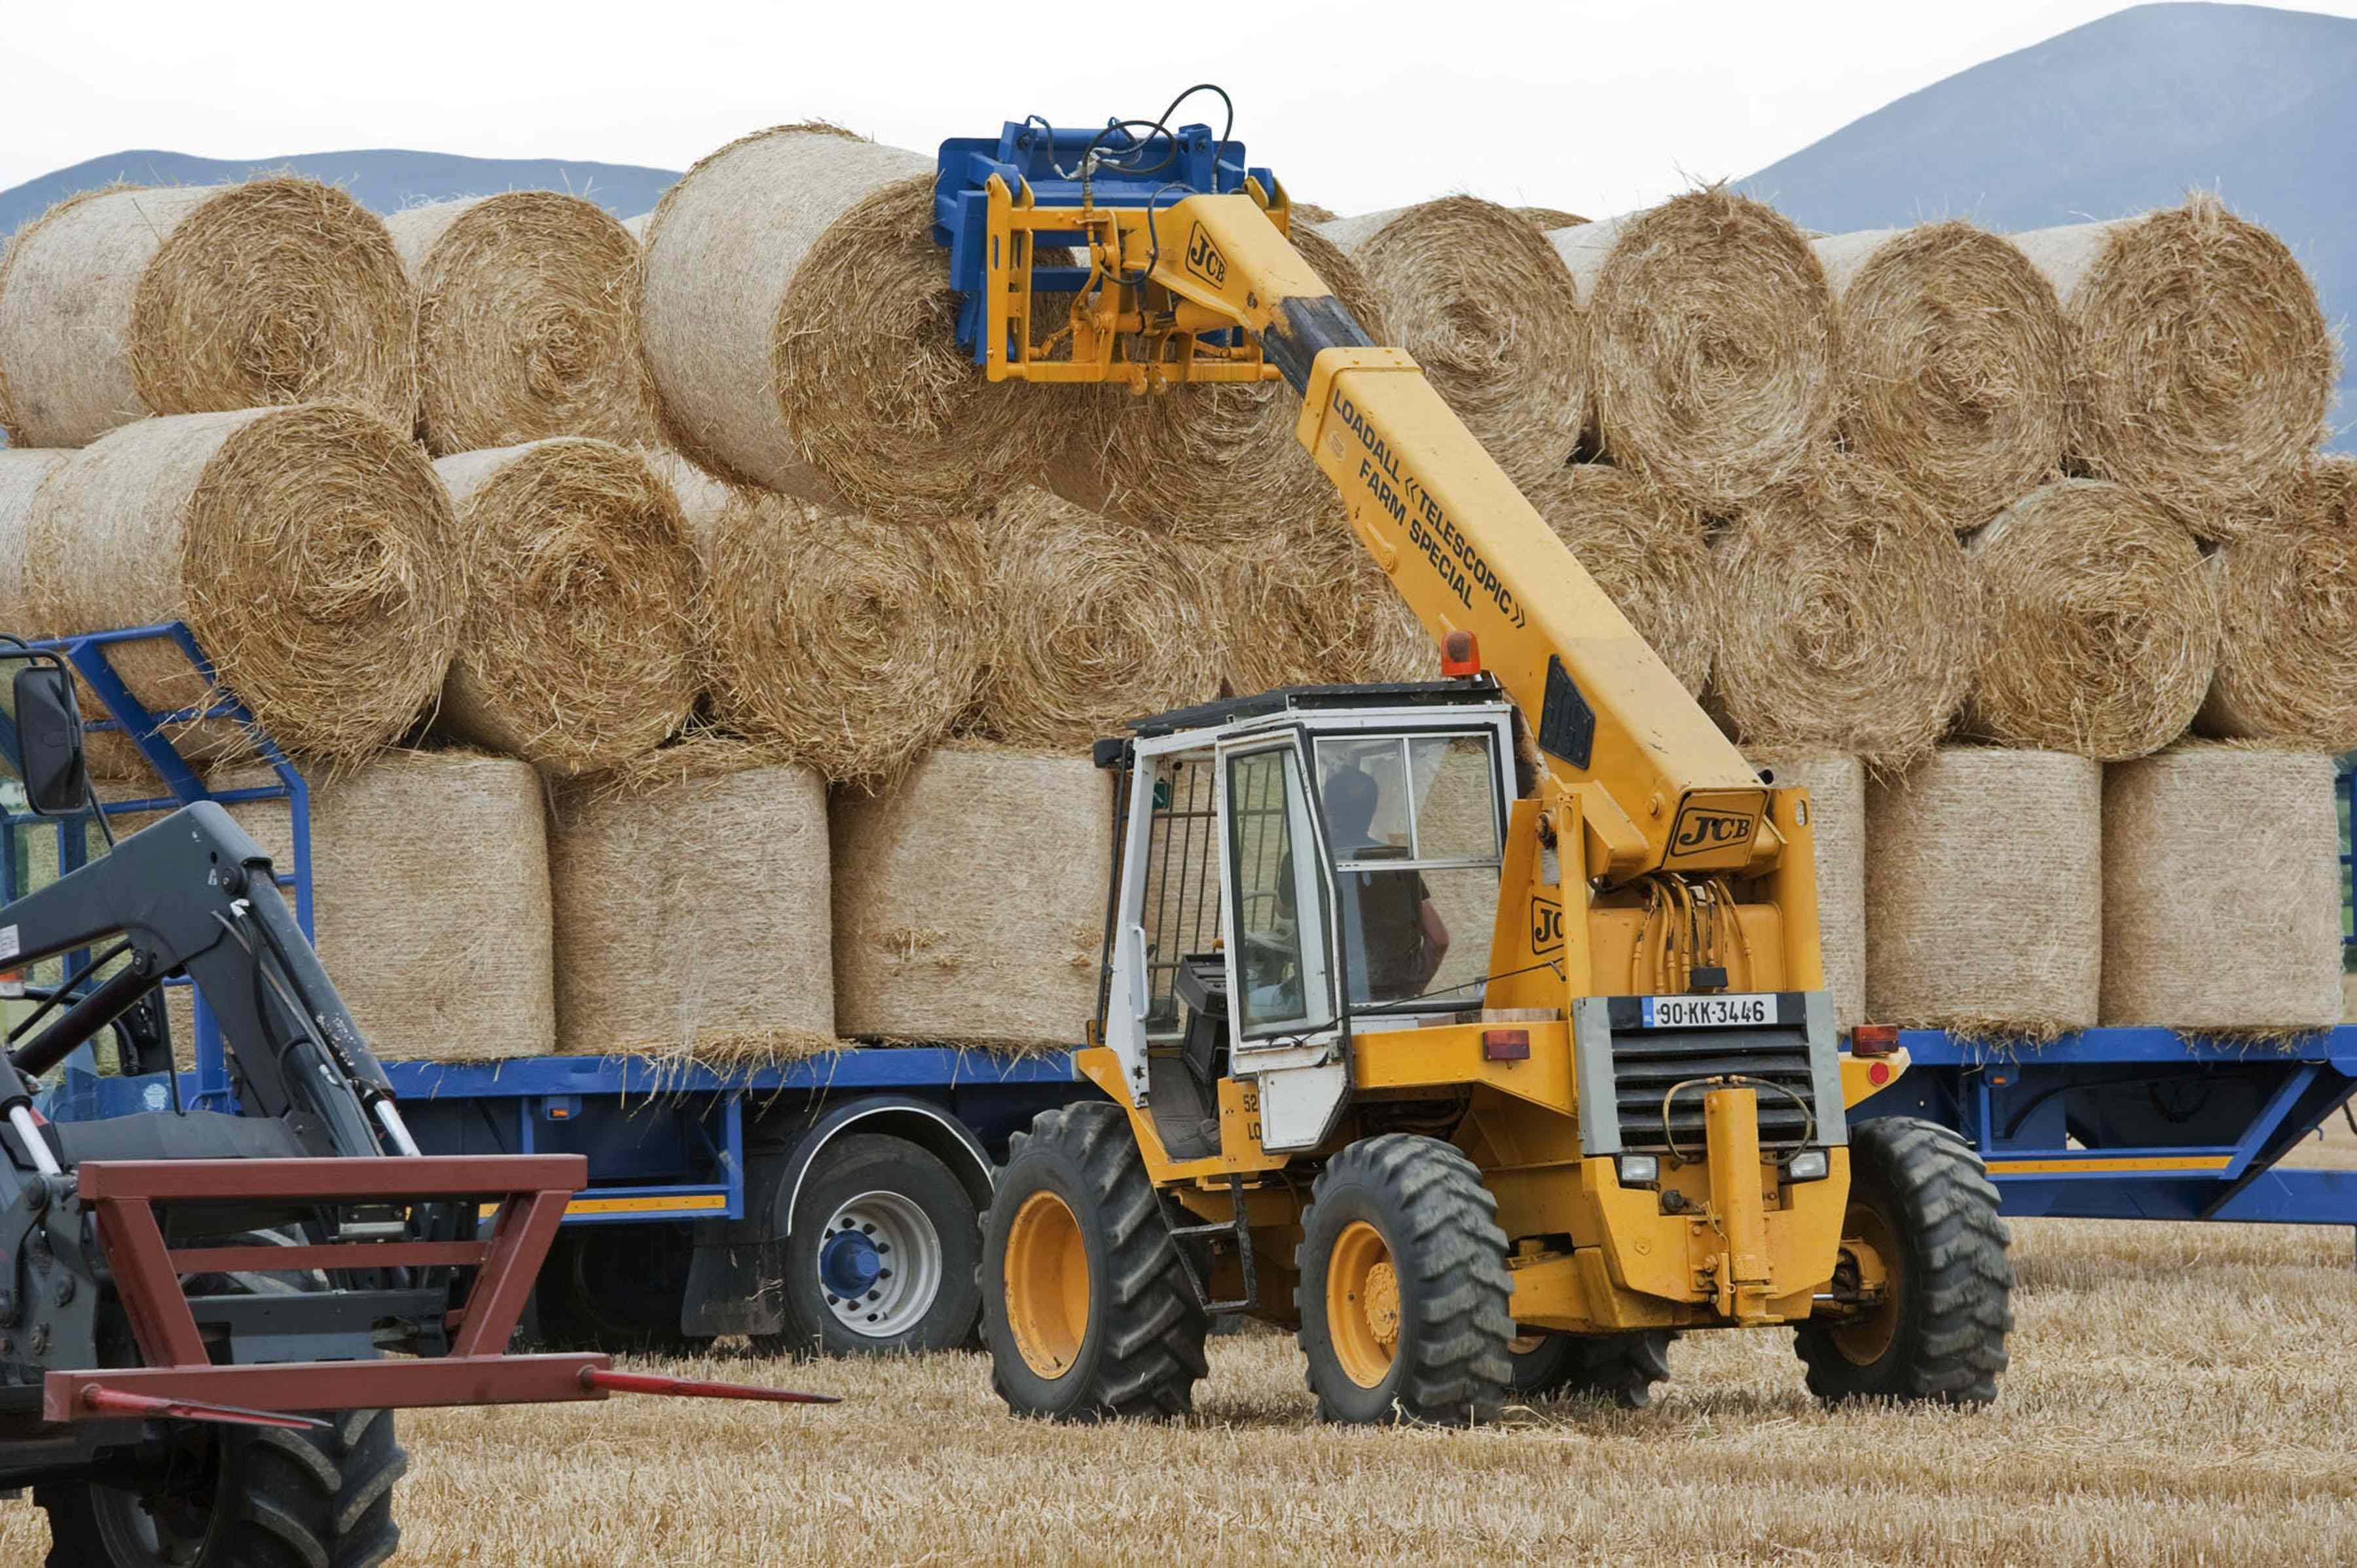 straw, harvest straw bales prices best year ever, straw,